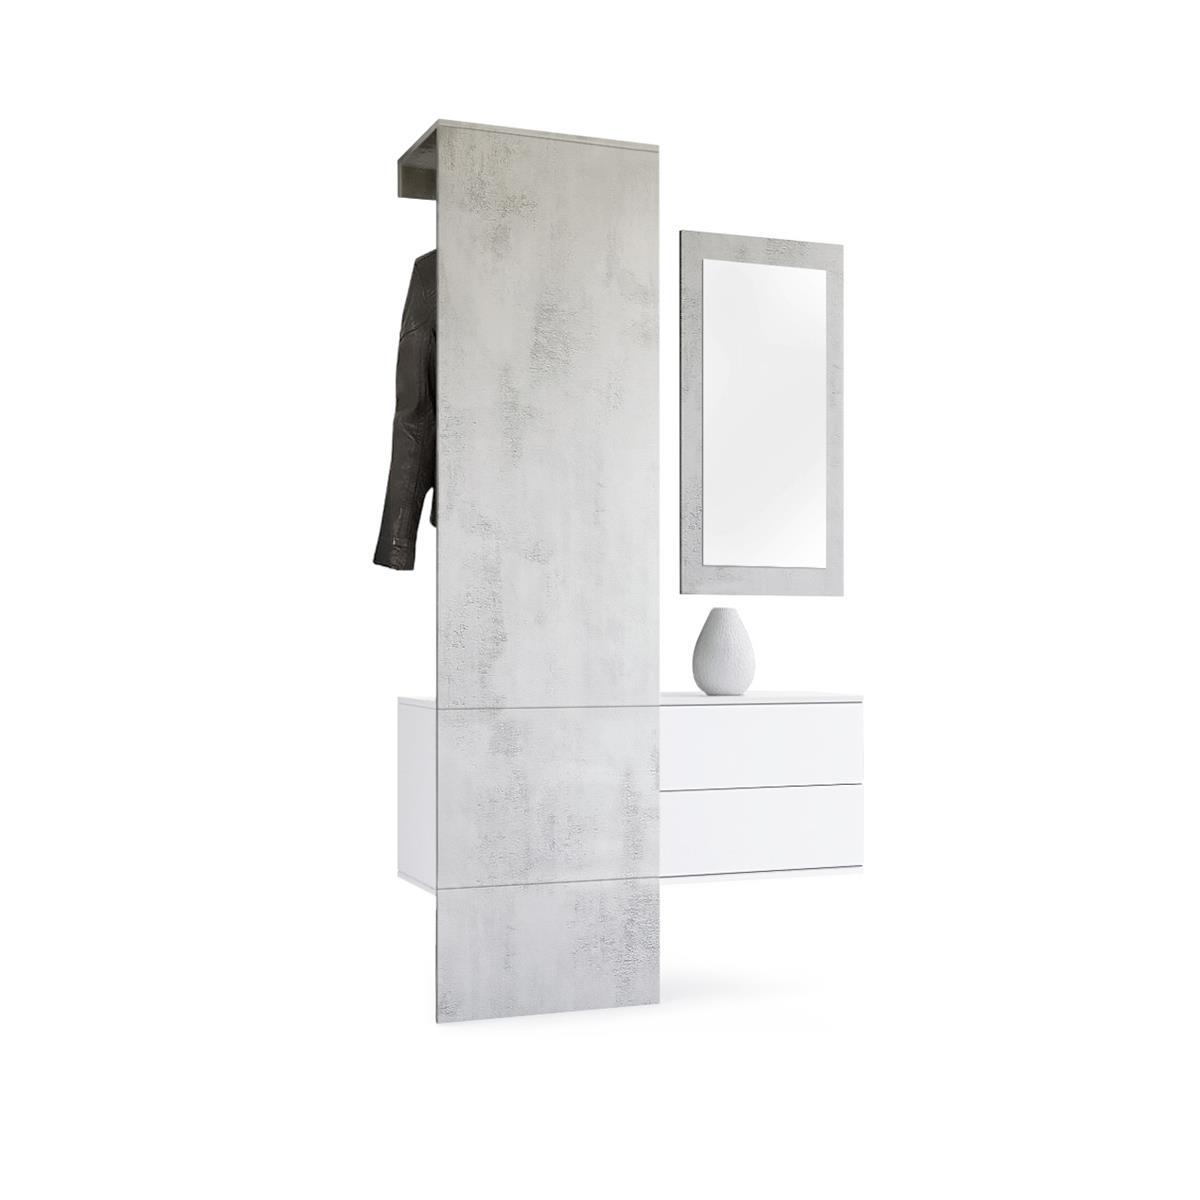 garderobe garderobenset flur spiegel paneele carlton set 2 in beton oxid optik ebay. Black Bedroom Furniture Sets. Home Design Ideas